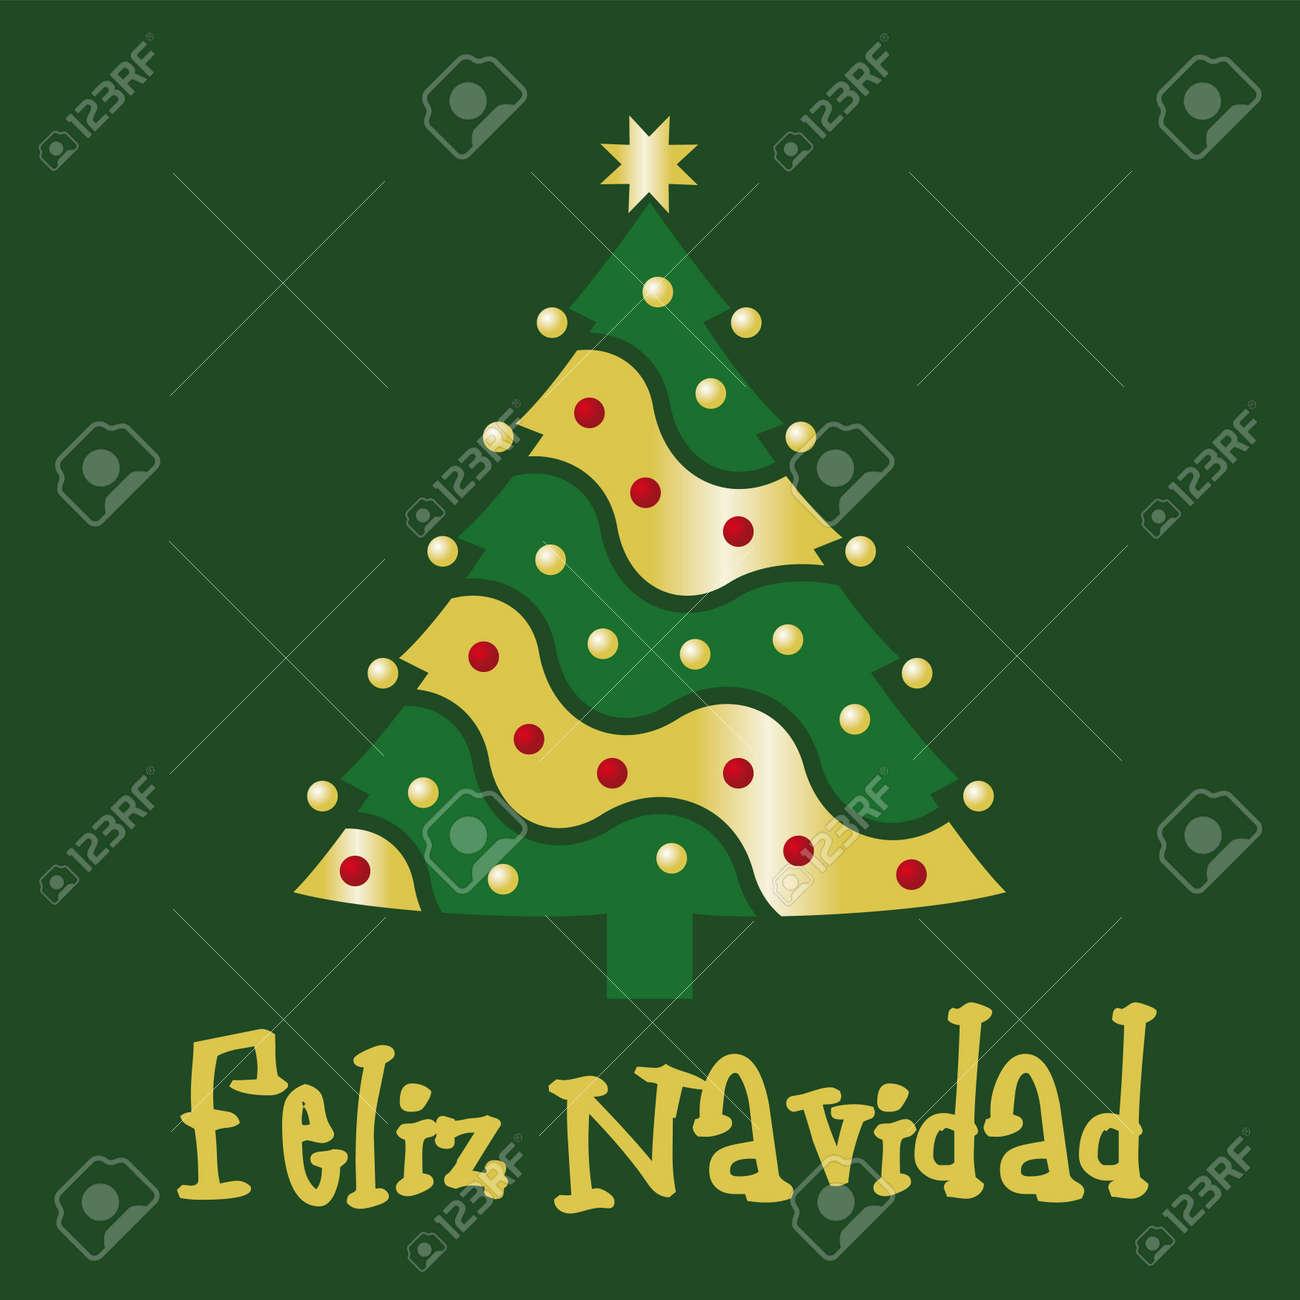 Christmas Card Green Spanish Royalty Free Cliparts, Vectors, And ...